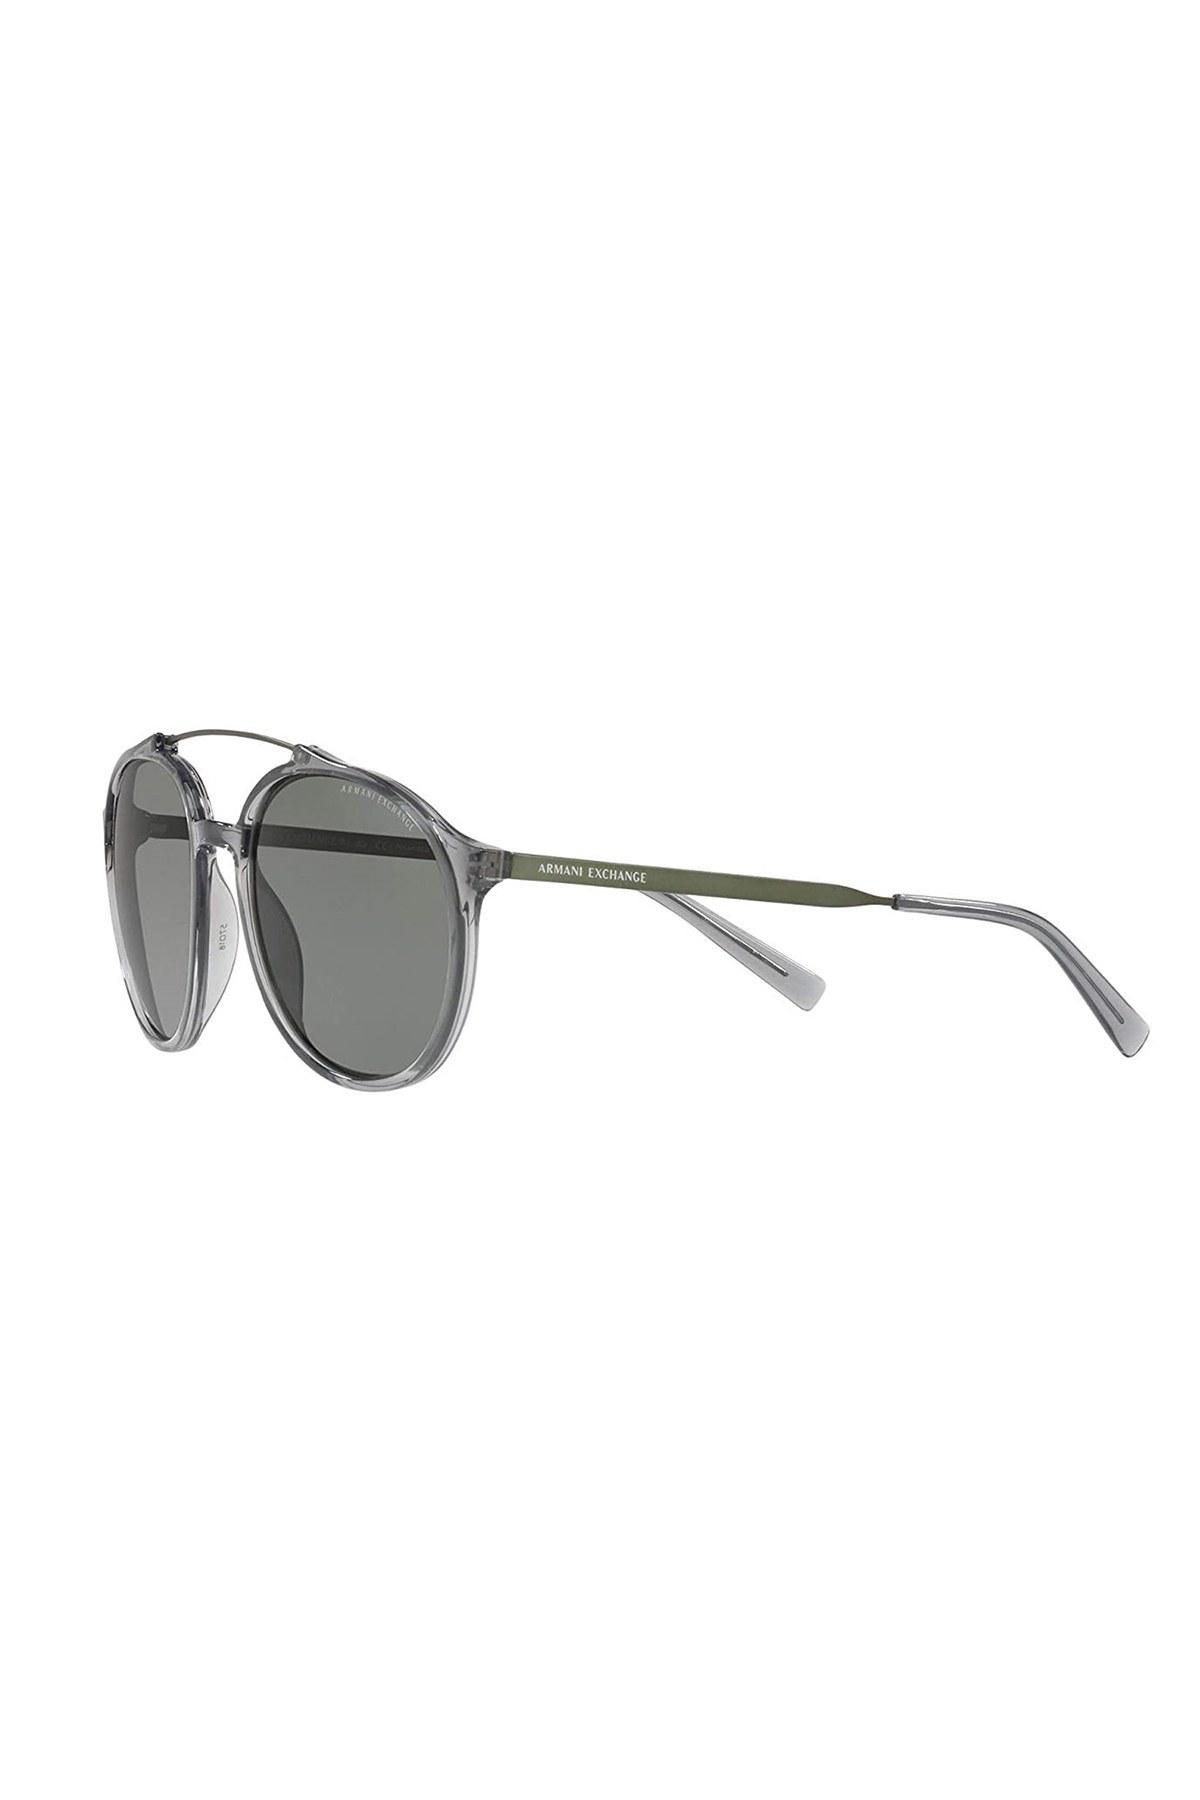 Armani Exchange Erkek Gözlük 0AX4069S 82439A 57 KOYU GRİ